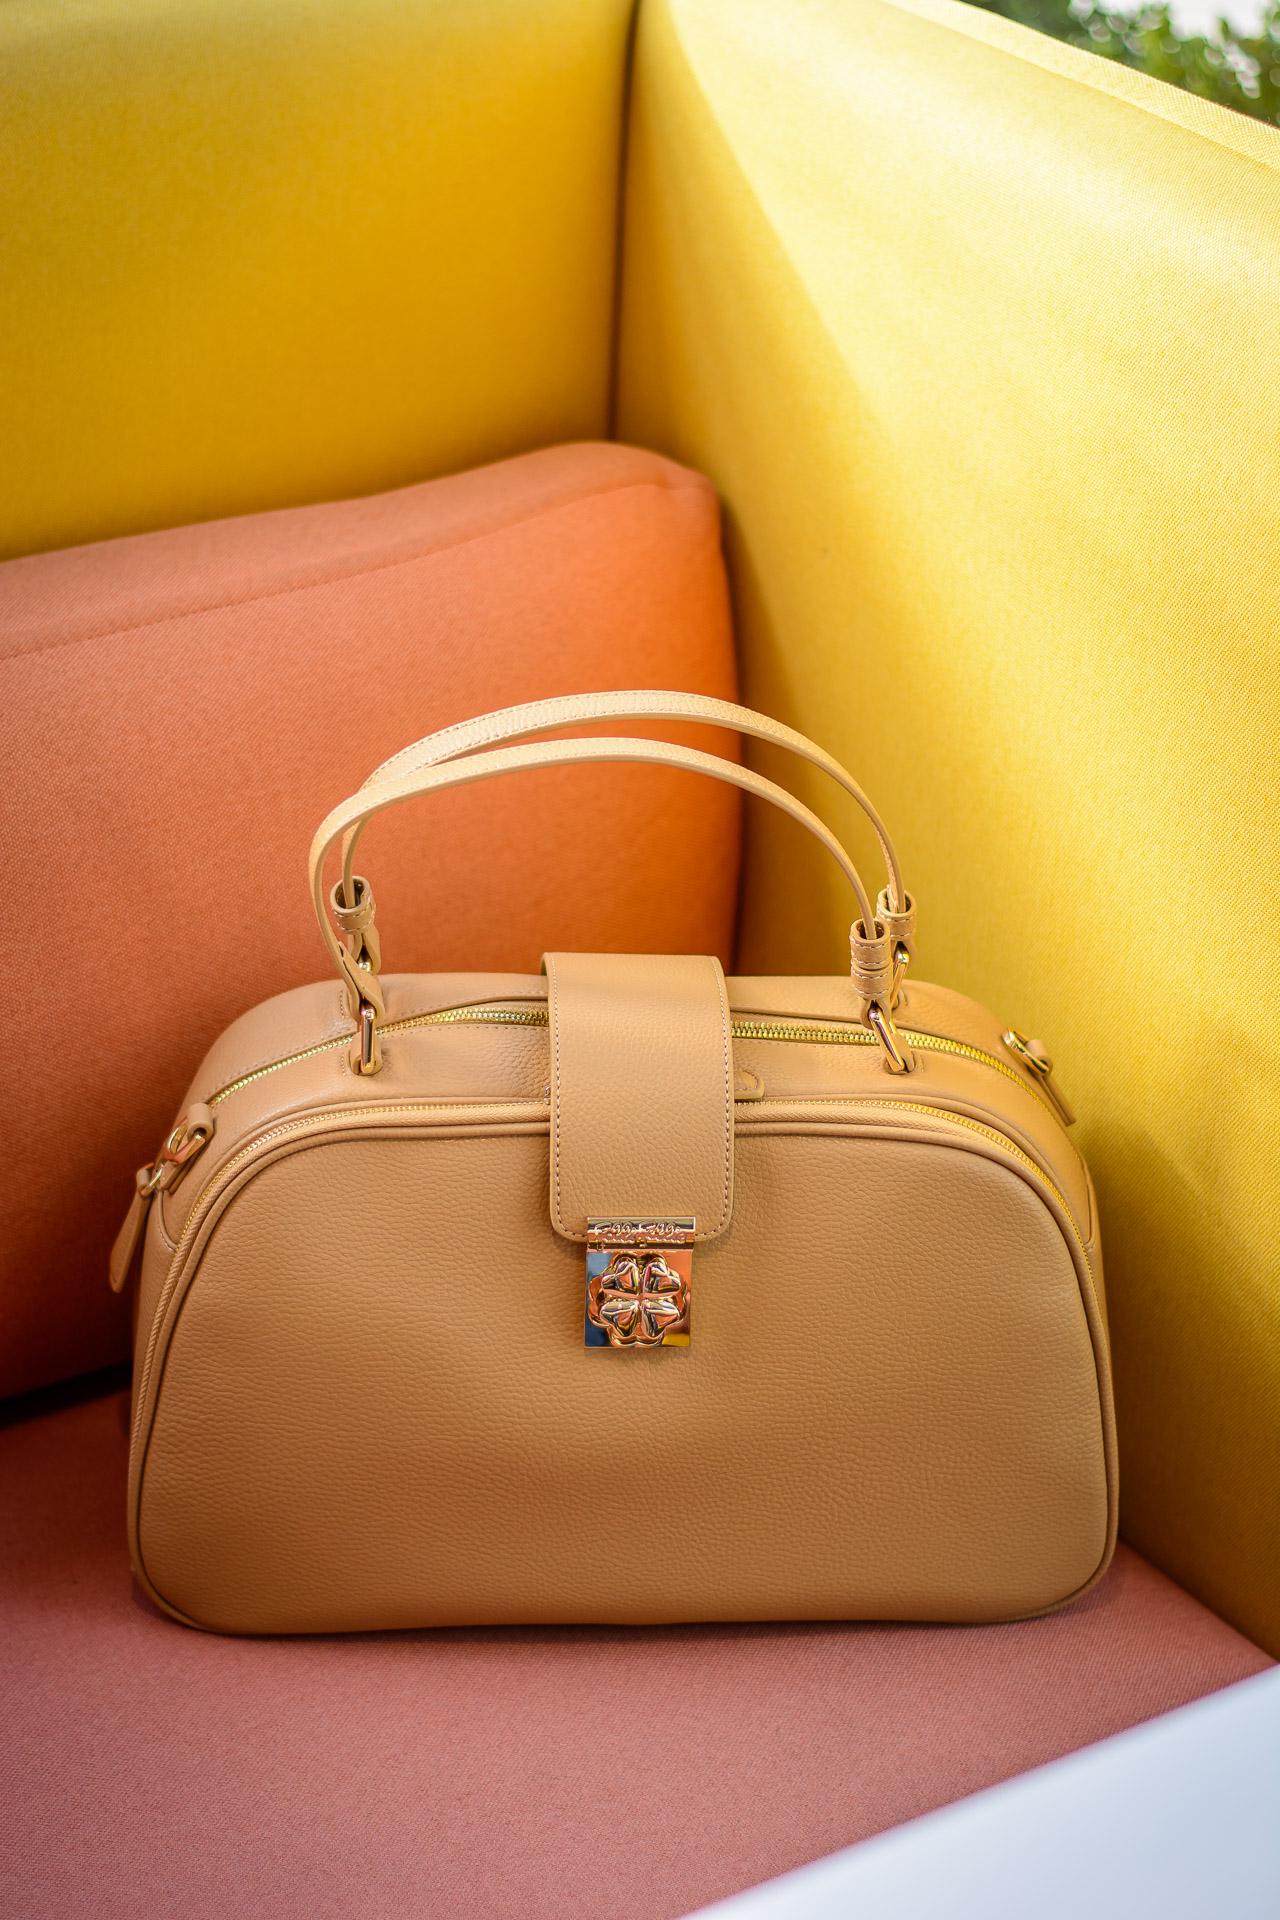 Folli Follie handbag